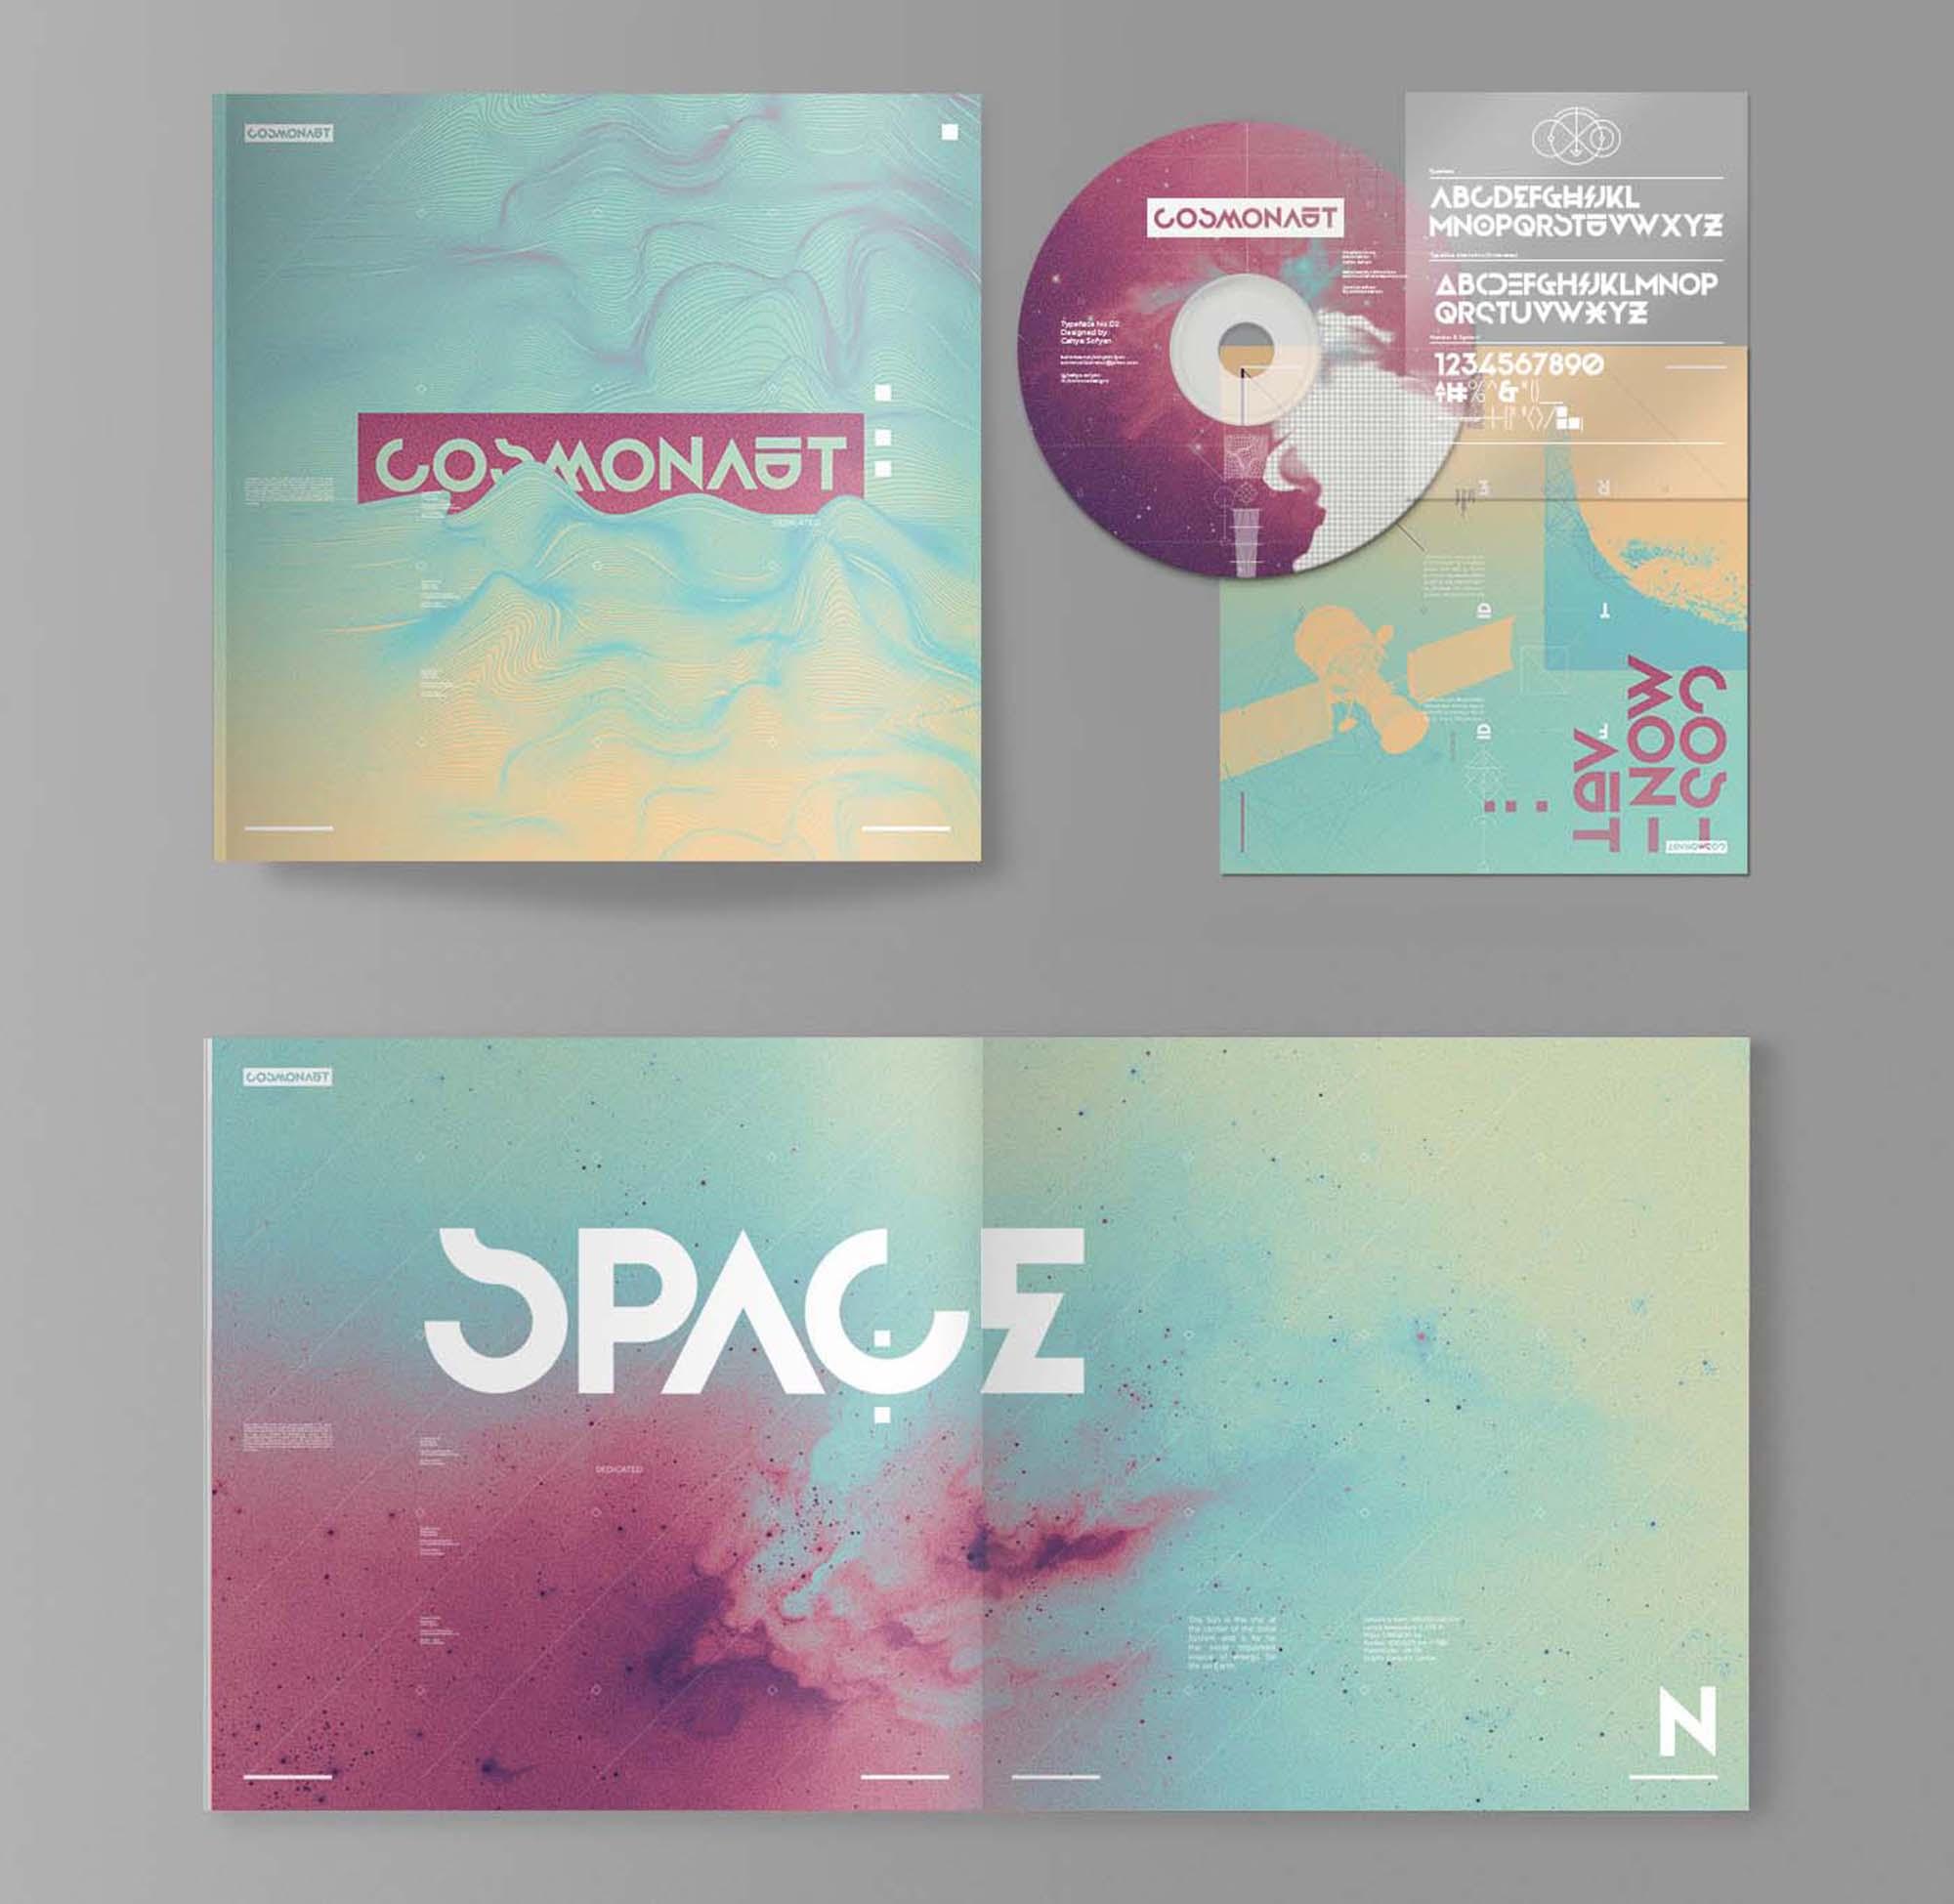 Cosmonaut Font 06